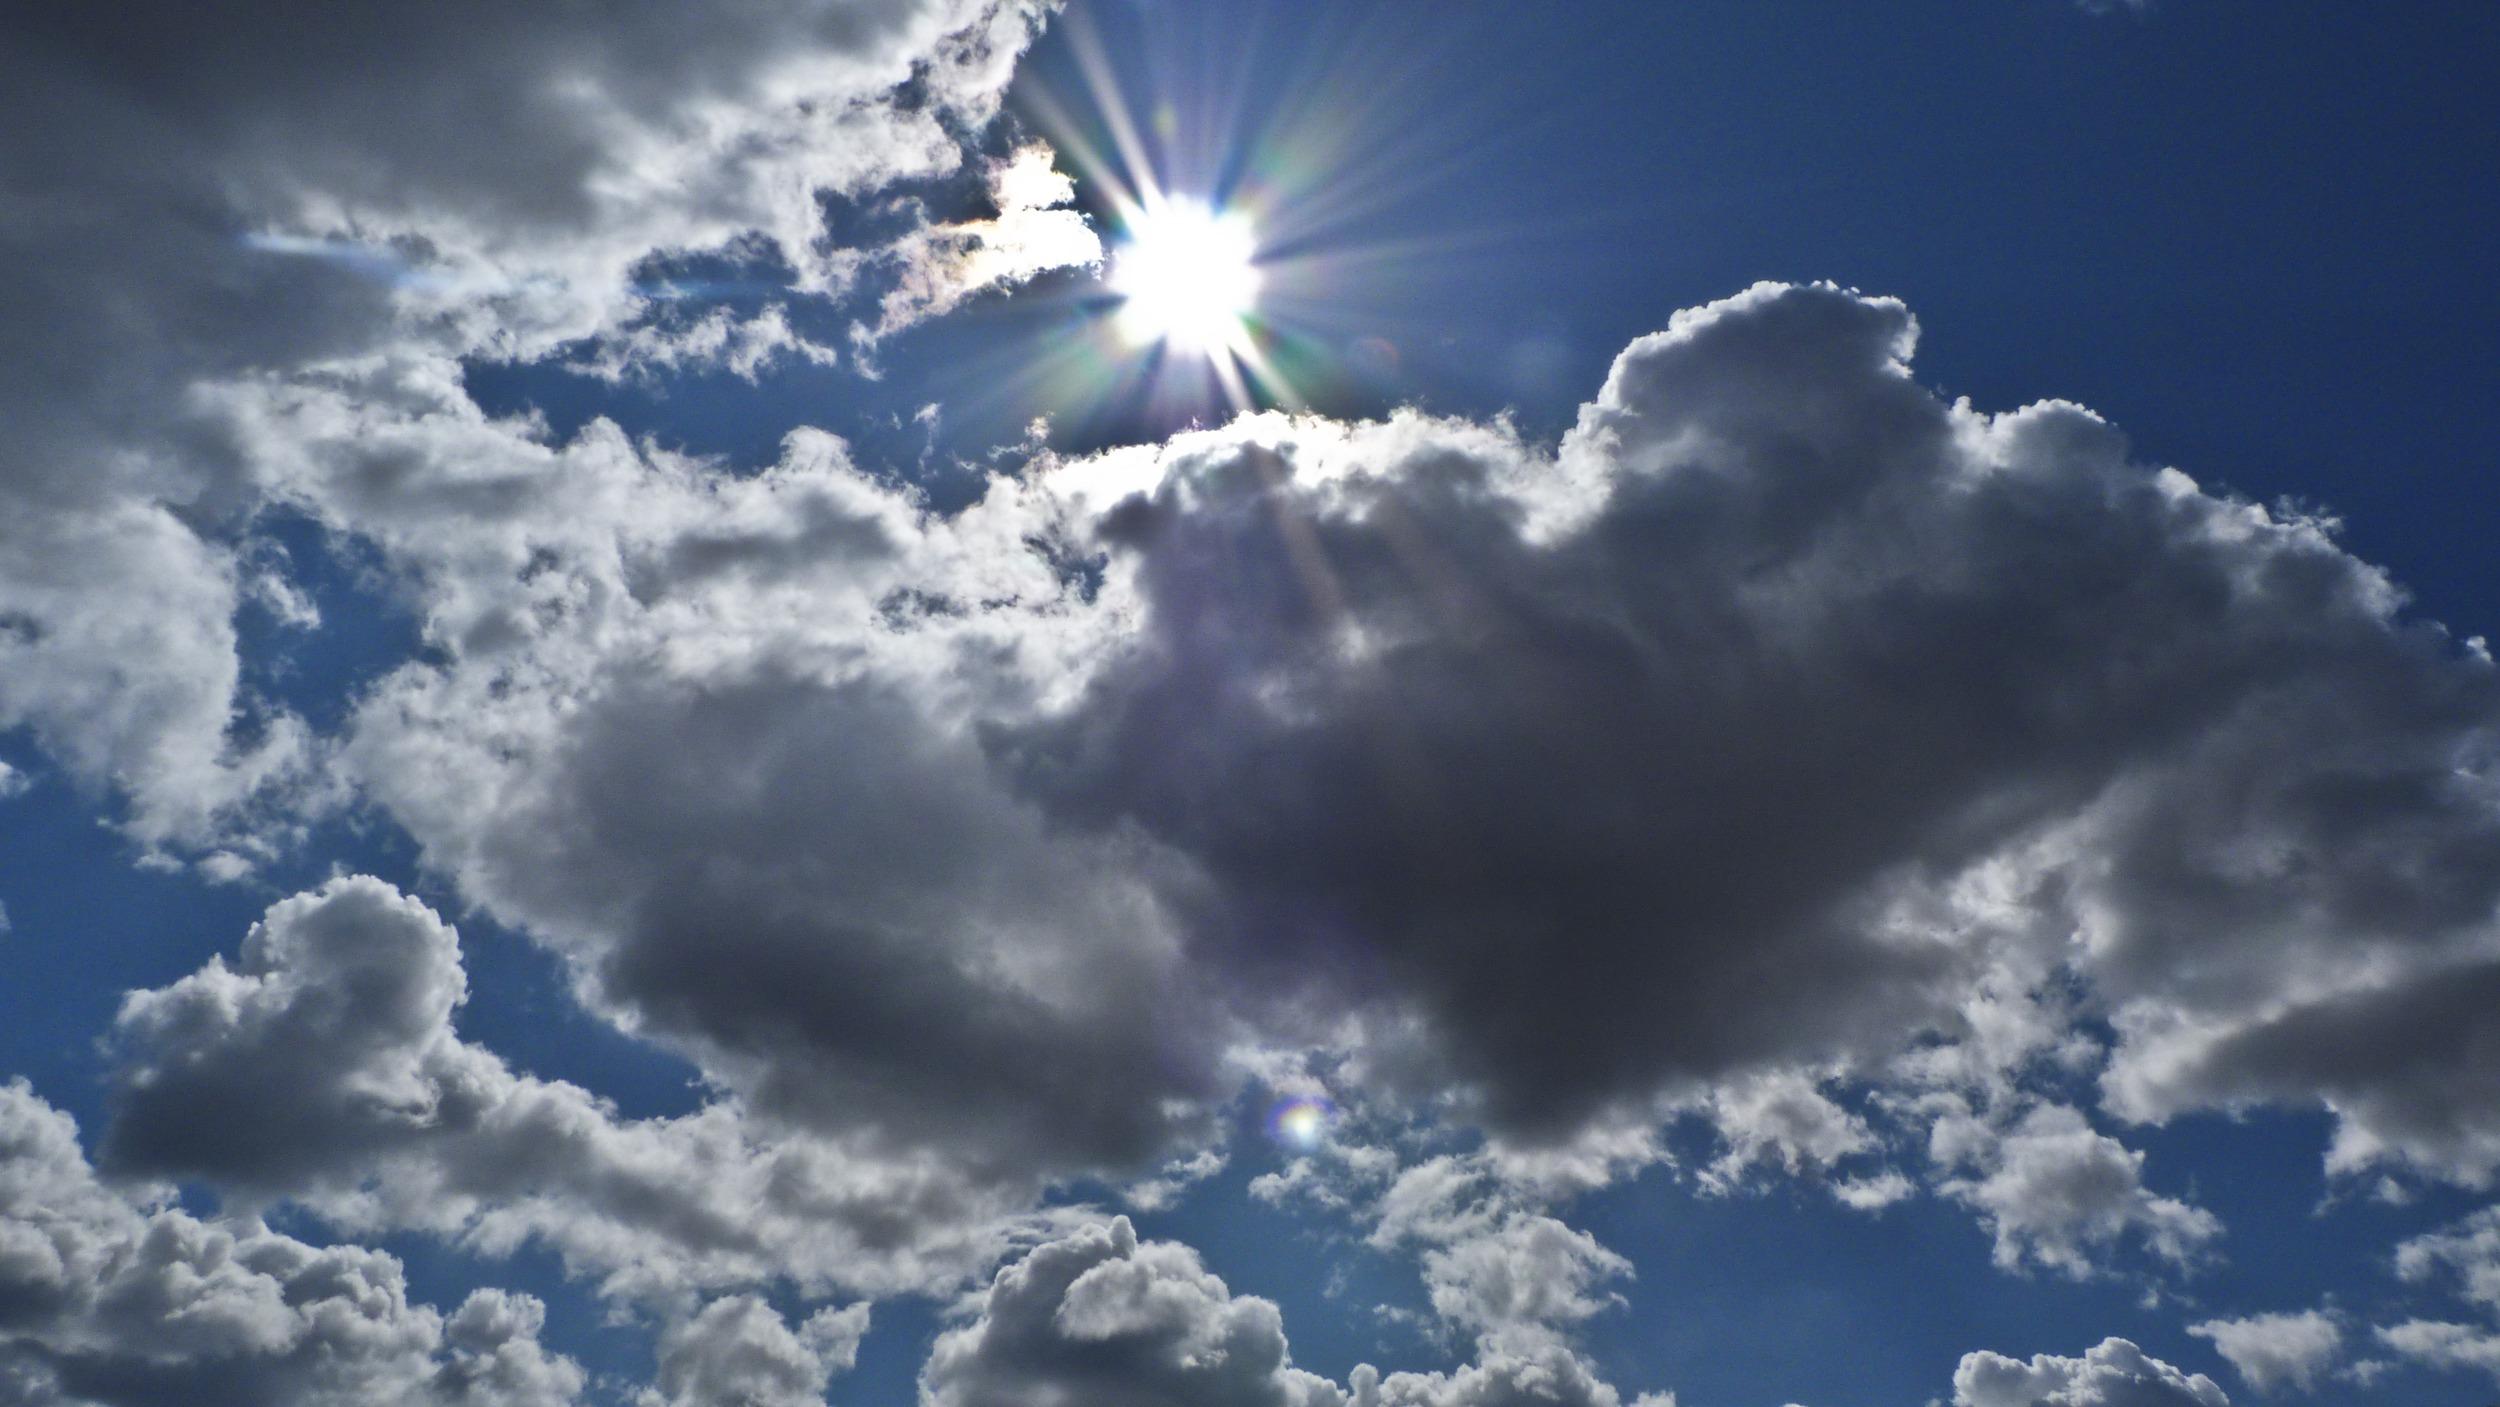 sunshine_sky_clouds.jpg